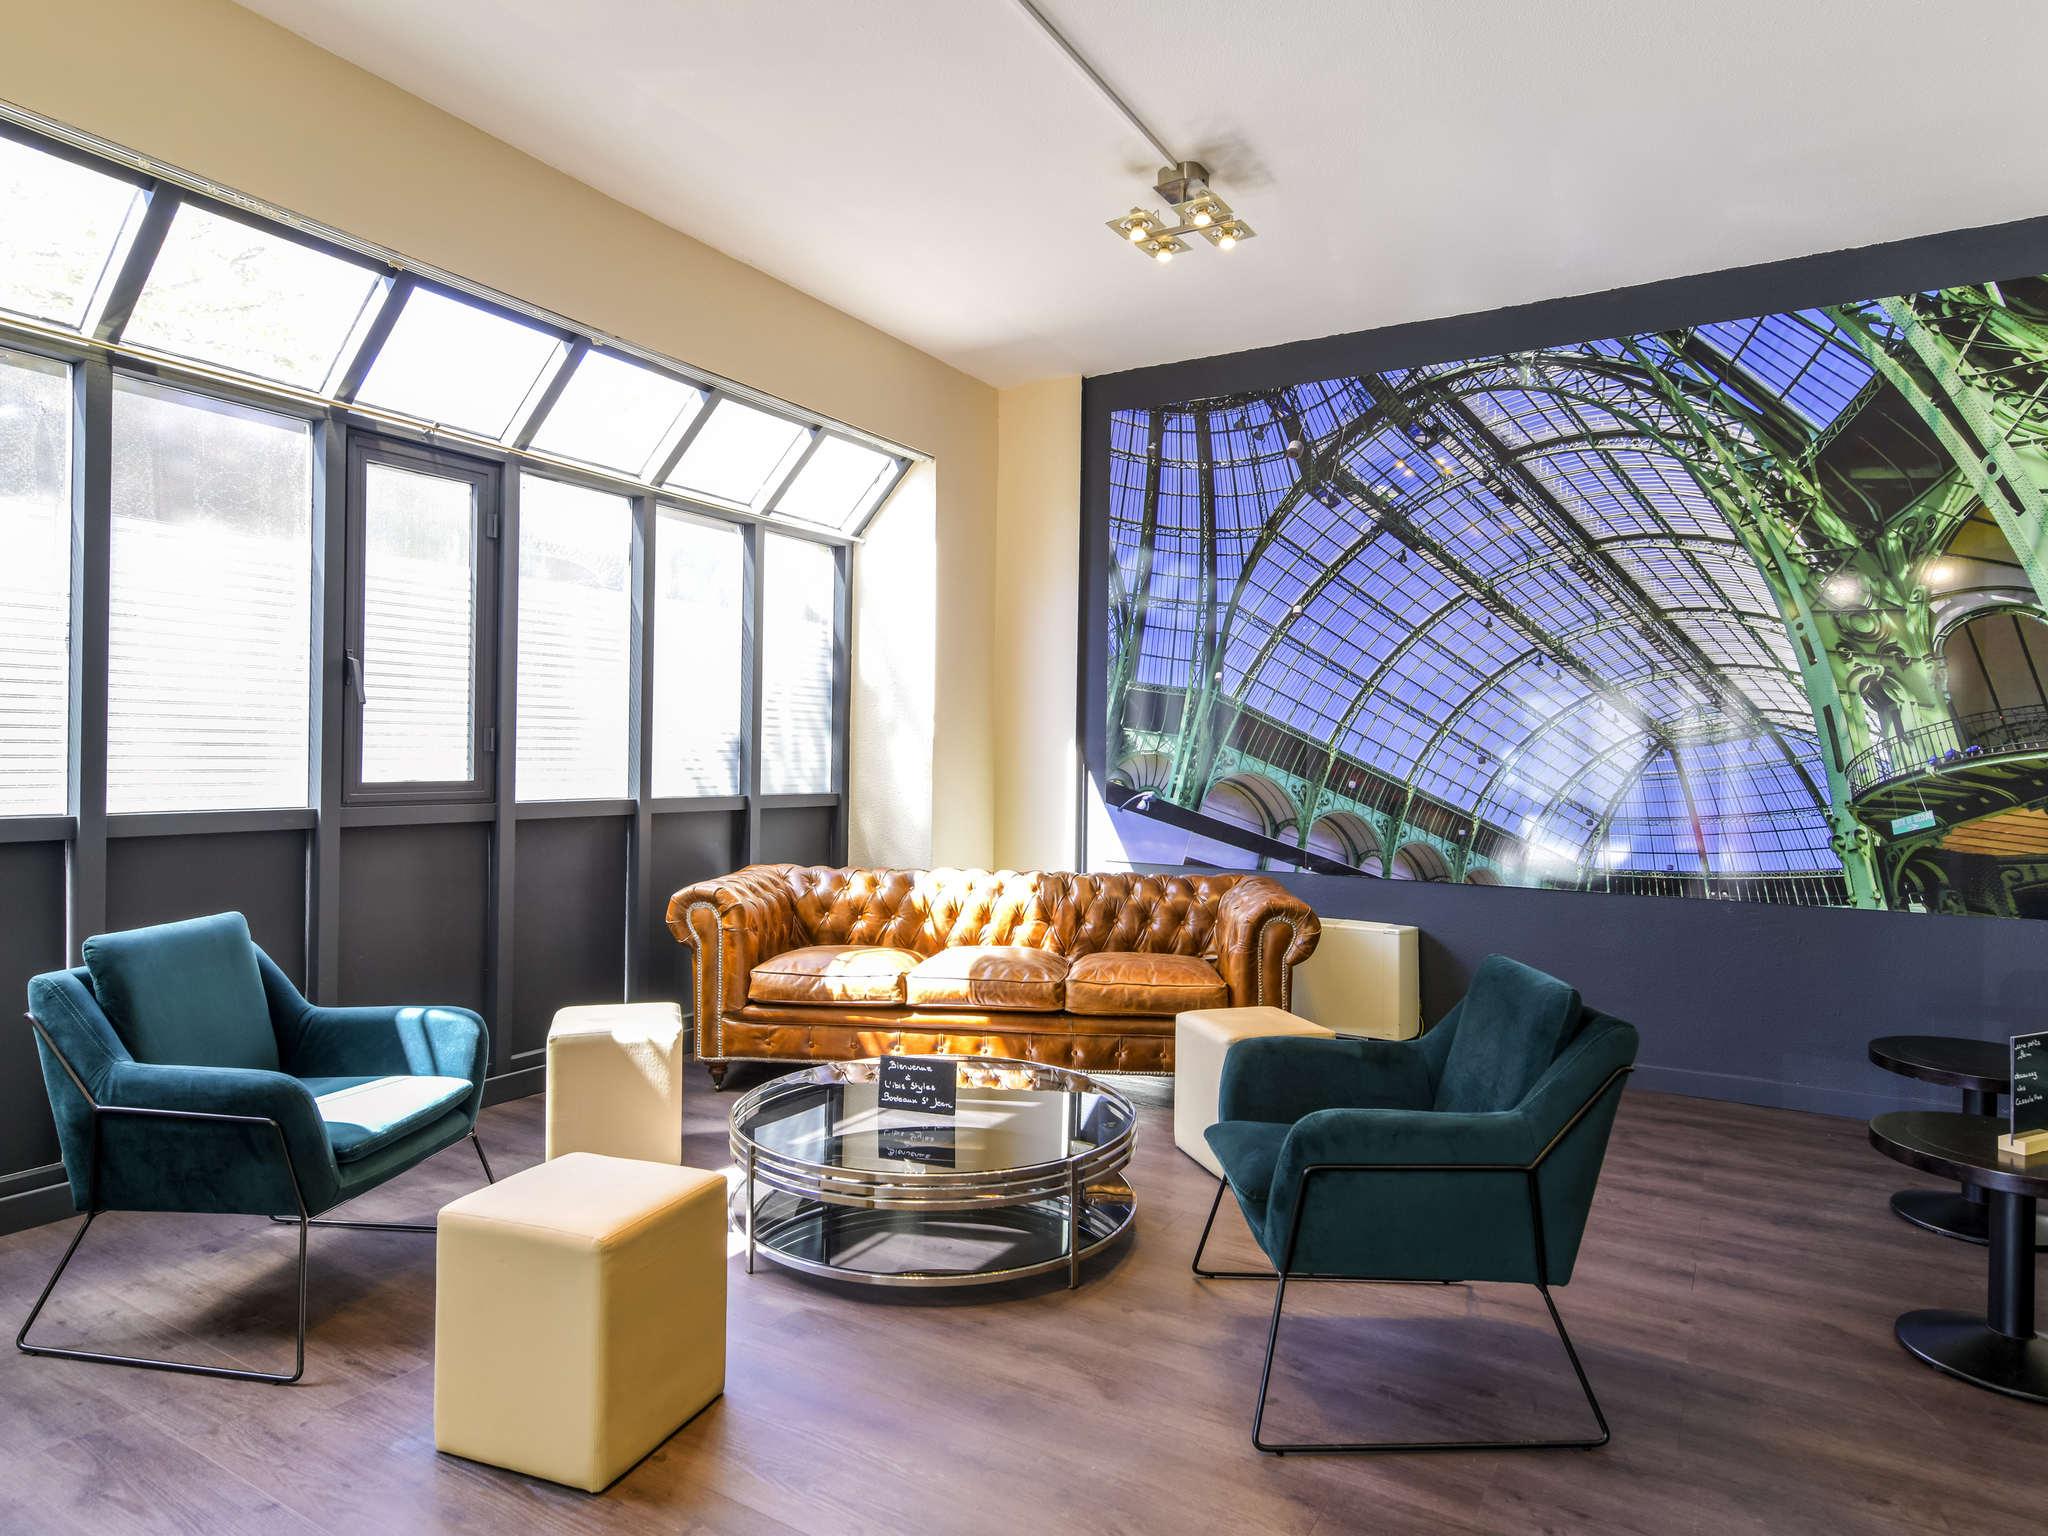 location voiture gare bordeaux st jean. Black Bedroom Furniture Sets. Home Design Ideas